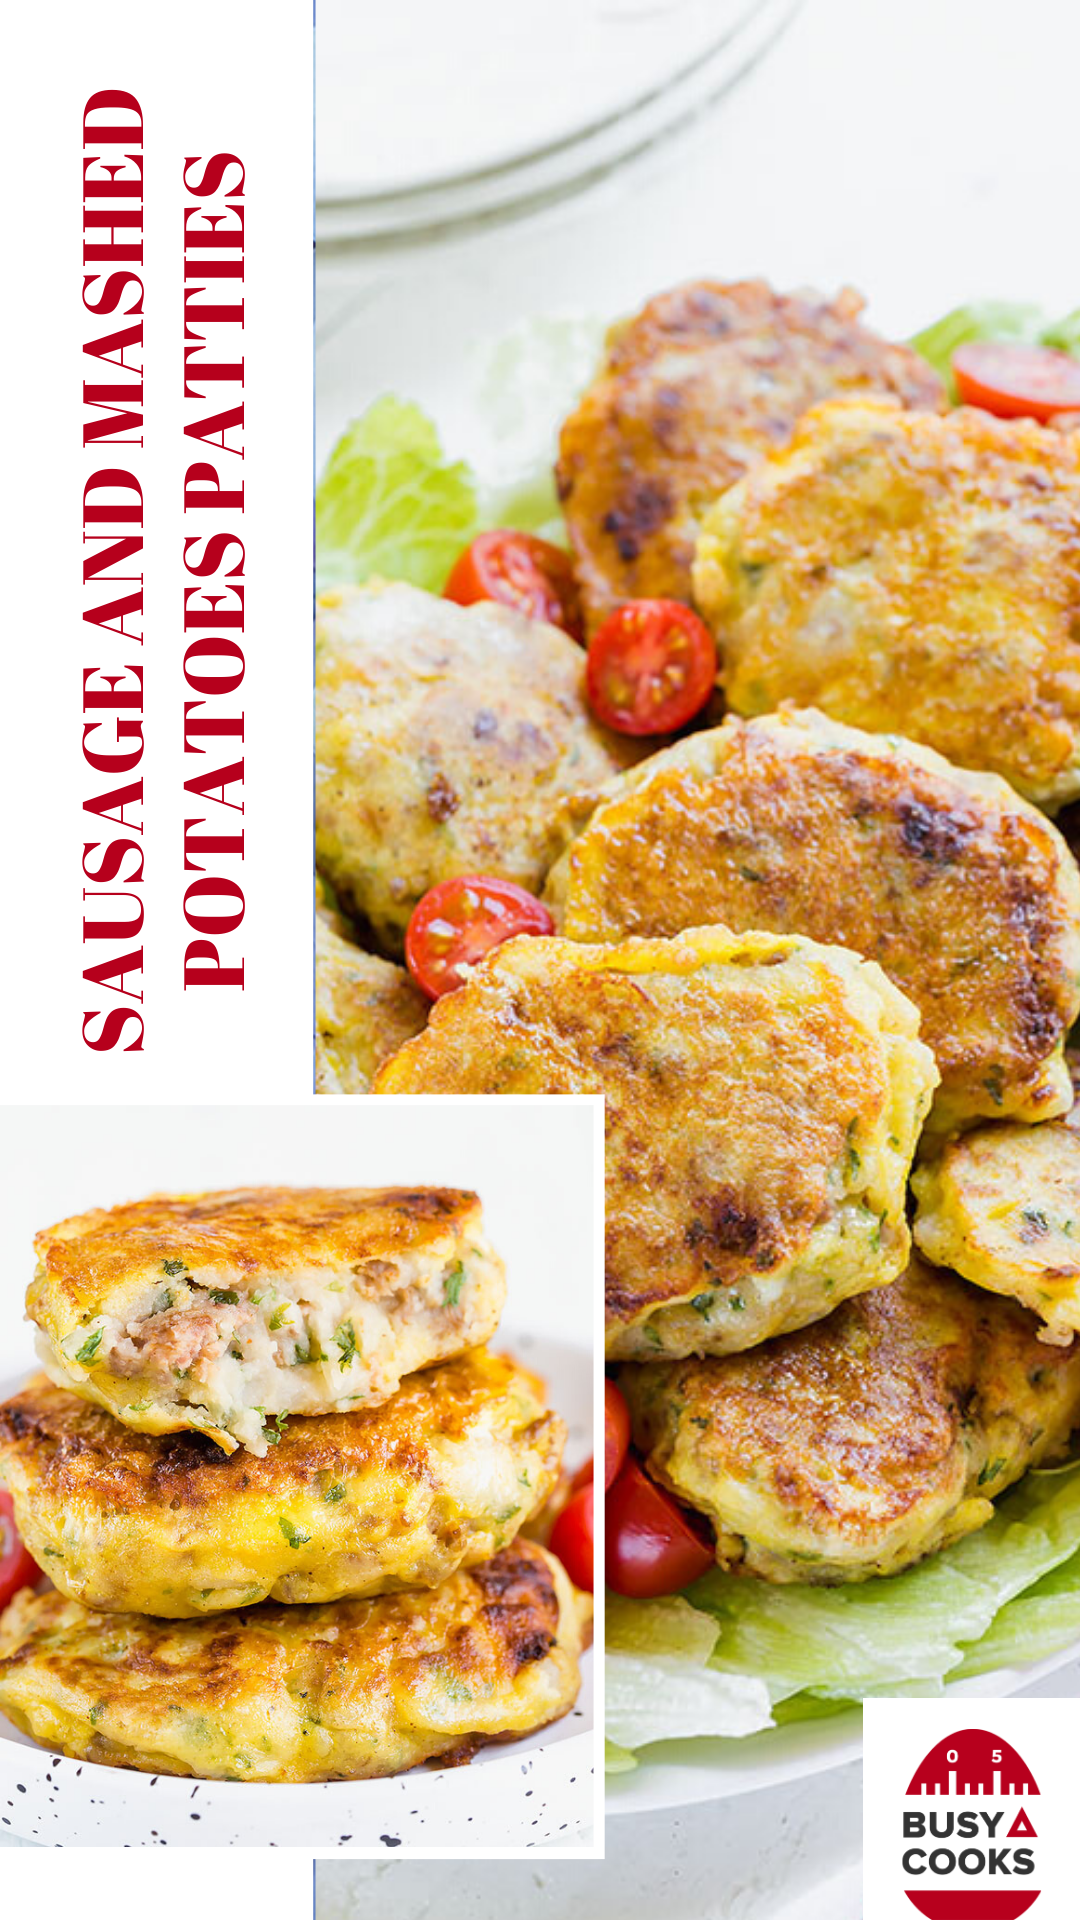 Sausage And Potato Croquettes Recipe Side Dish Recipes Easy Easy Dinner Recipes Potato Croquettes